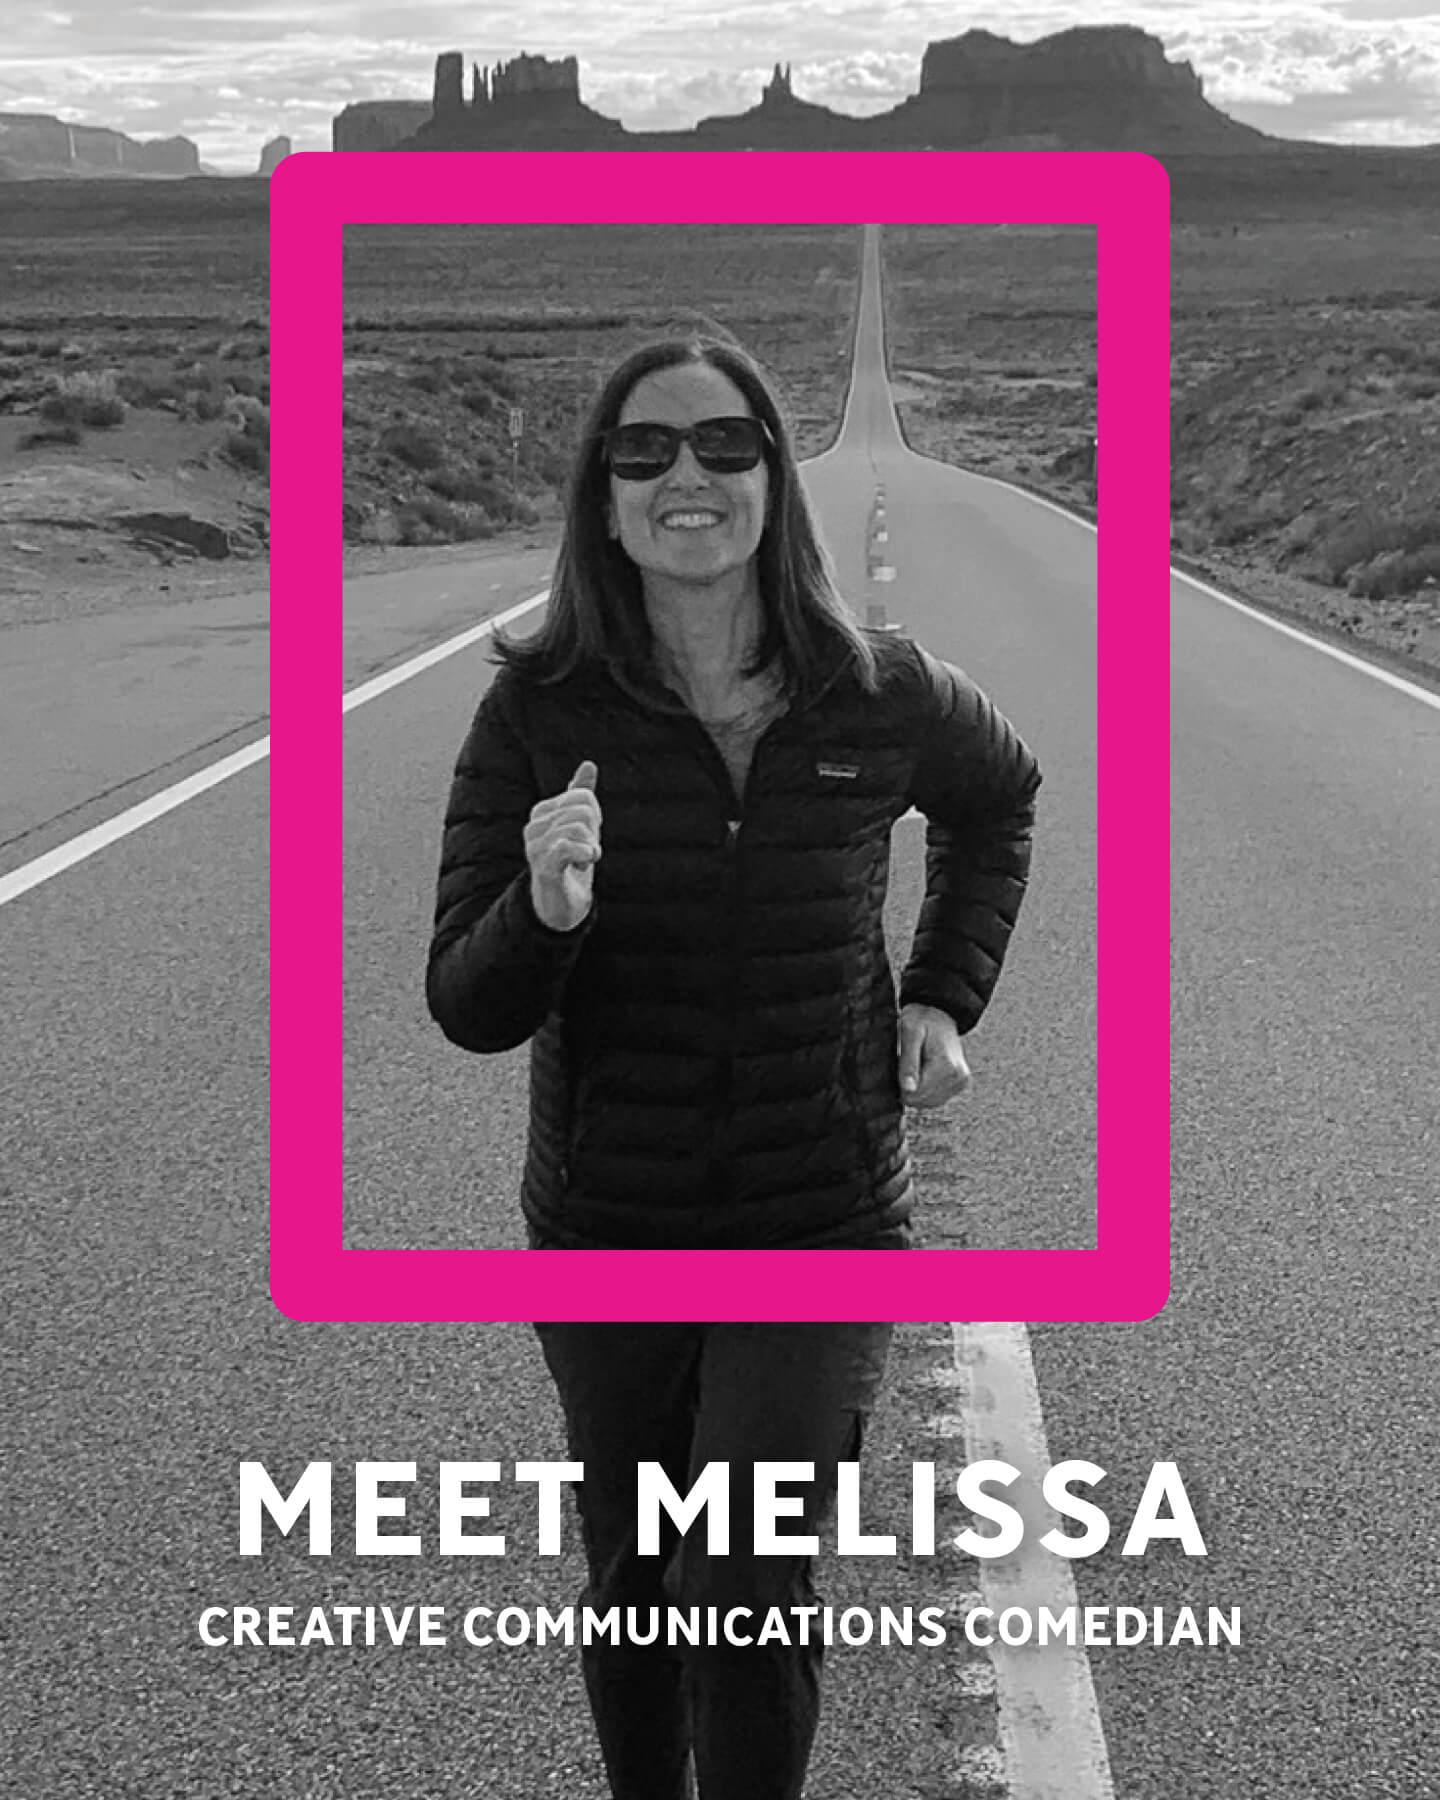 MIXX_25th_GrowthAgents_Social_Media_Melissa1